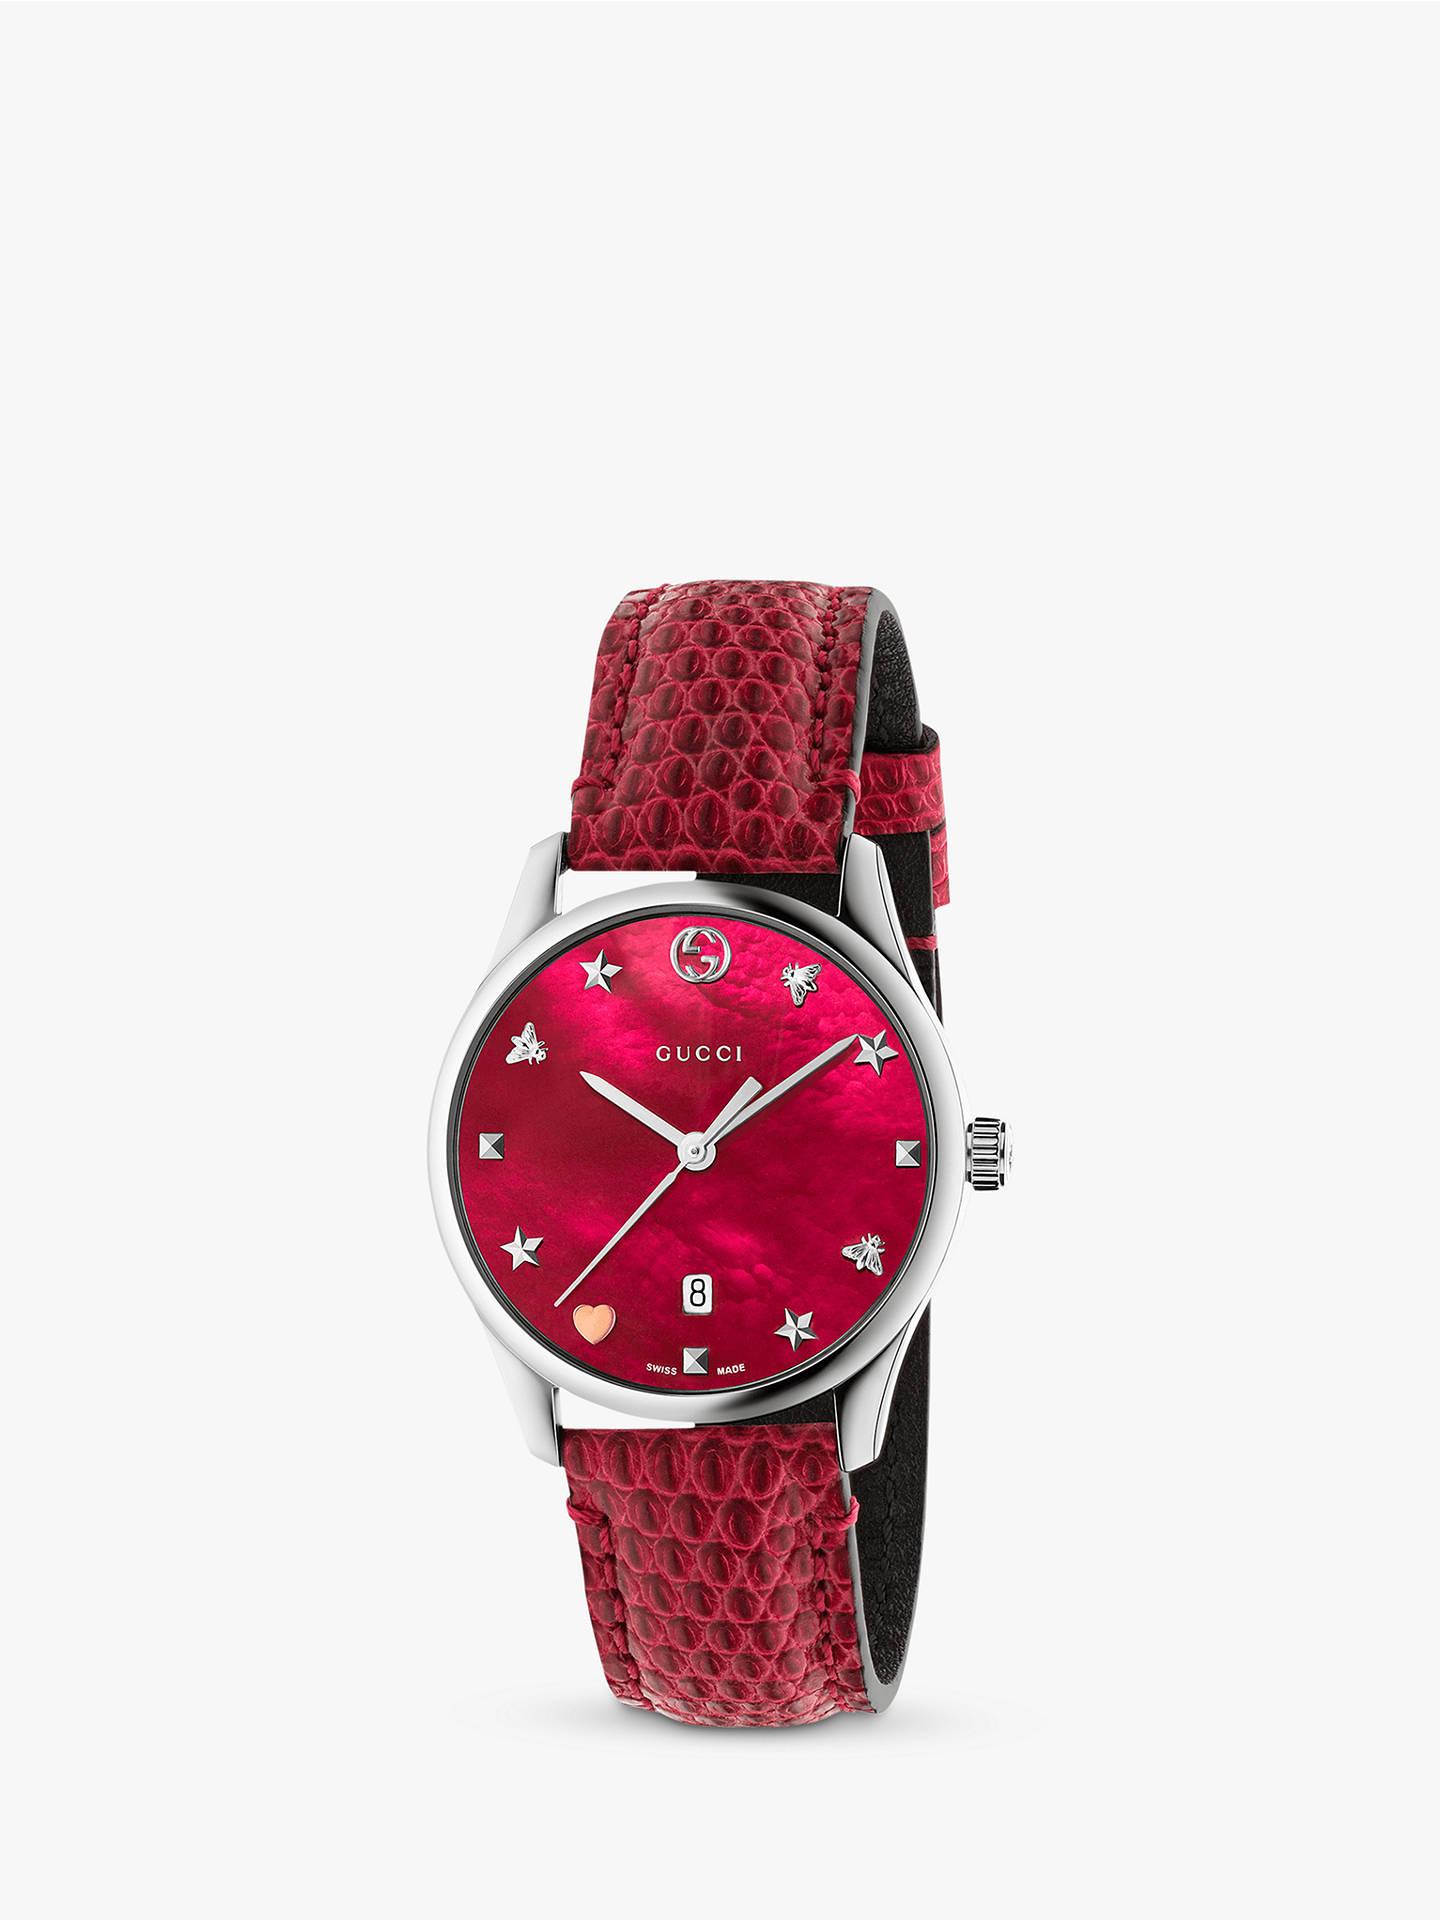 2d9d76d4dac Buy Gucci YA126584 Women s G-Timeless Date Leather Strap Watch